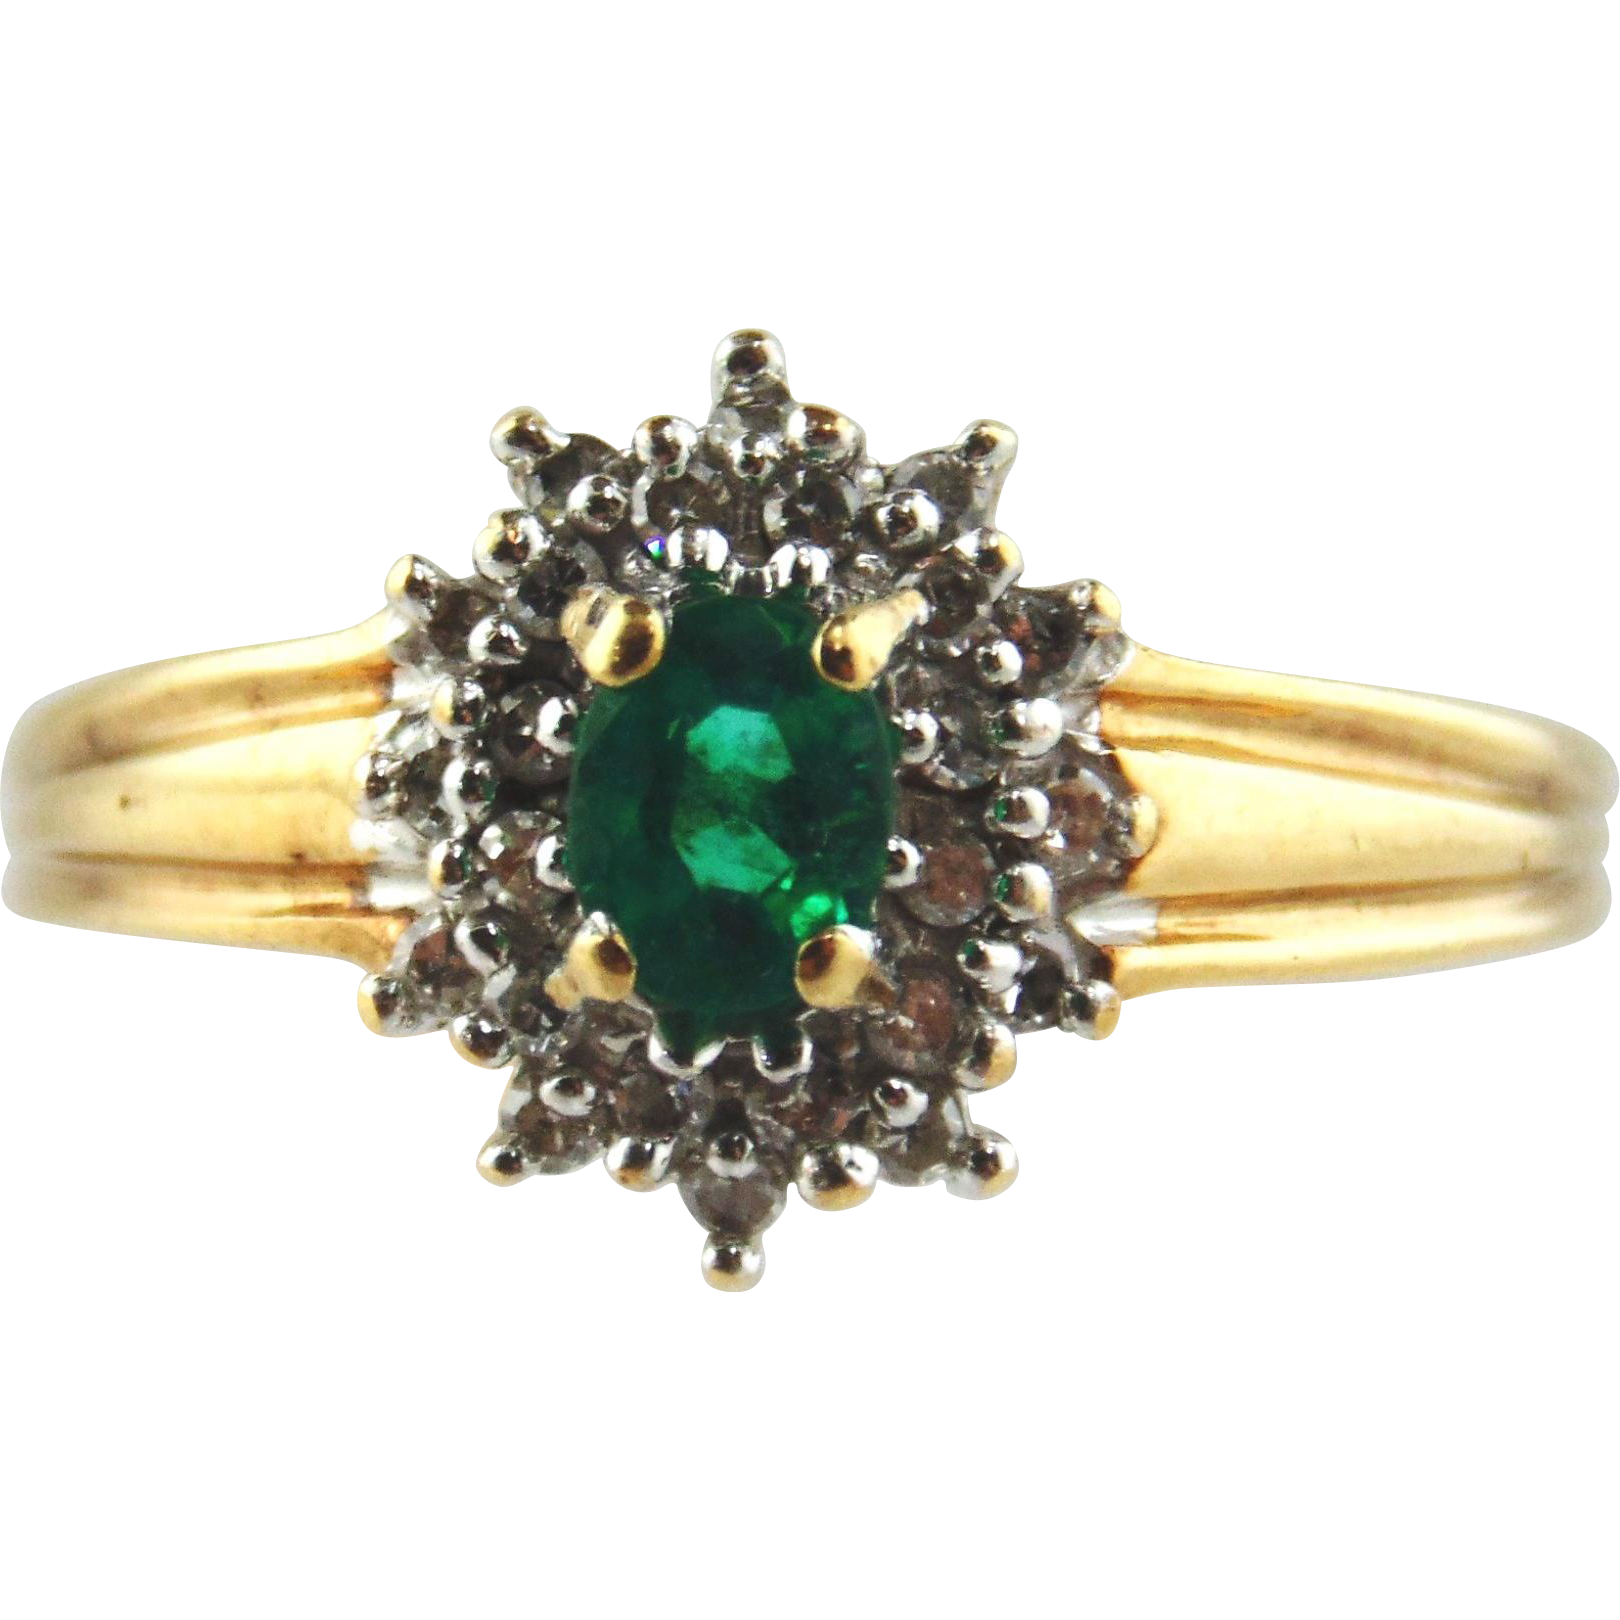 Emerald & Diamond Ring 10k Two Tone Gold , Size 7 3/4